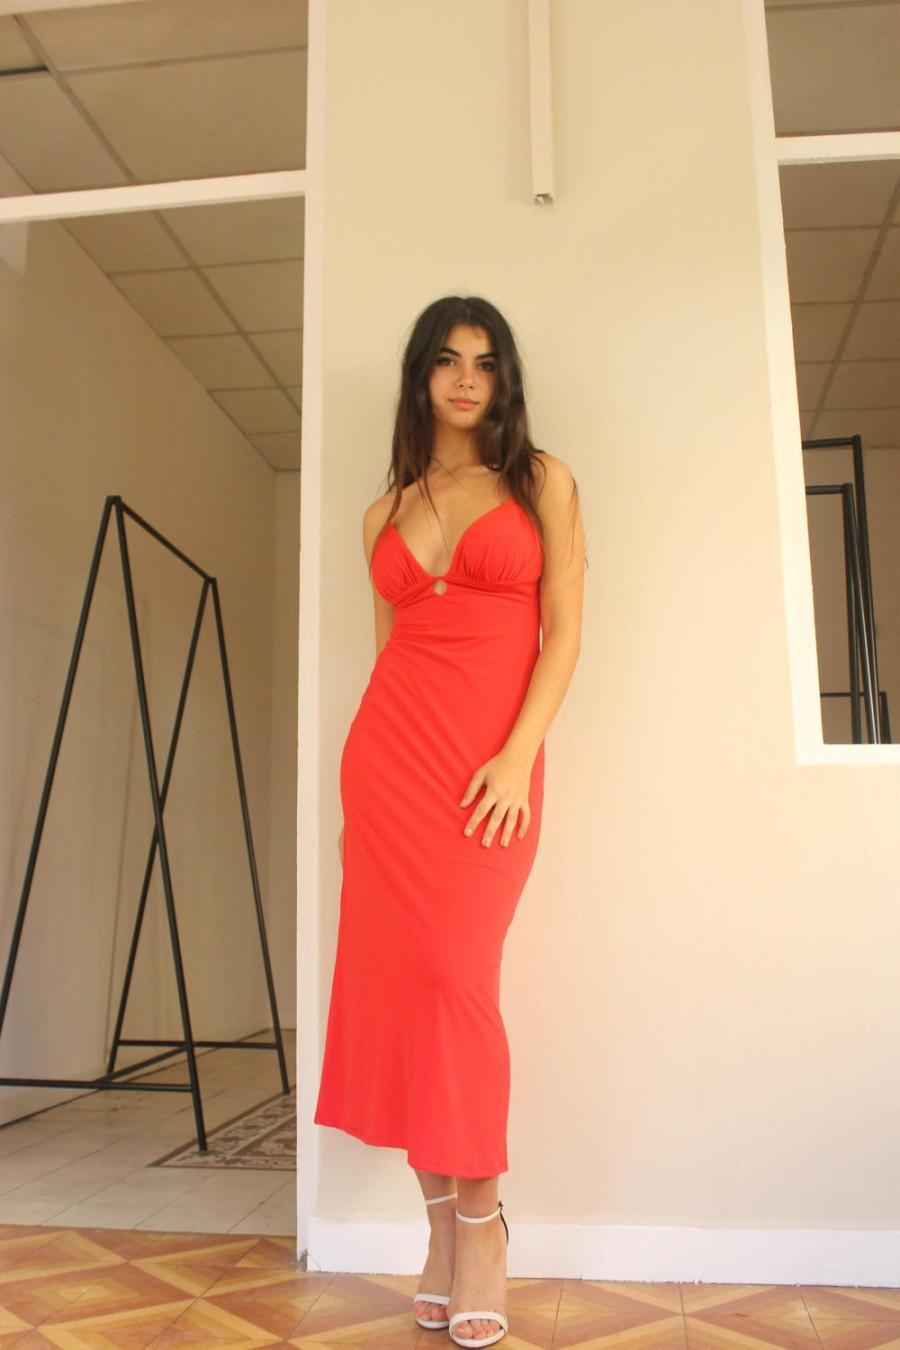 Wedding - Red Woman Dress, Midi Dress, Knee Length Dress, Party Dress, Prom Dress, Backless Dress, Evening Dress, Gown, Bridesmaid Dress, Custom Made